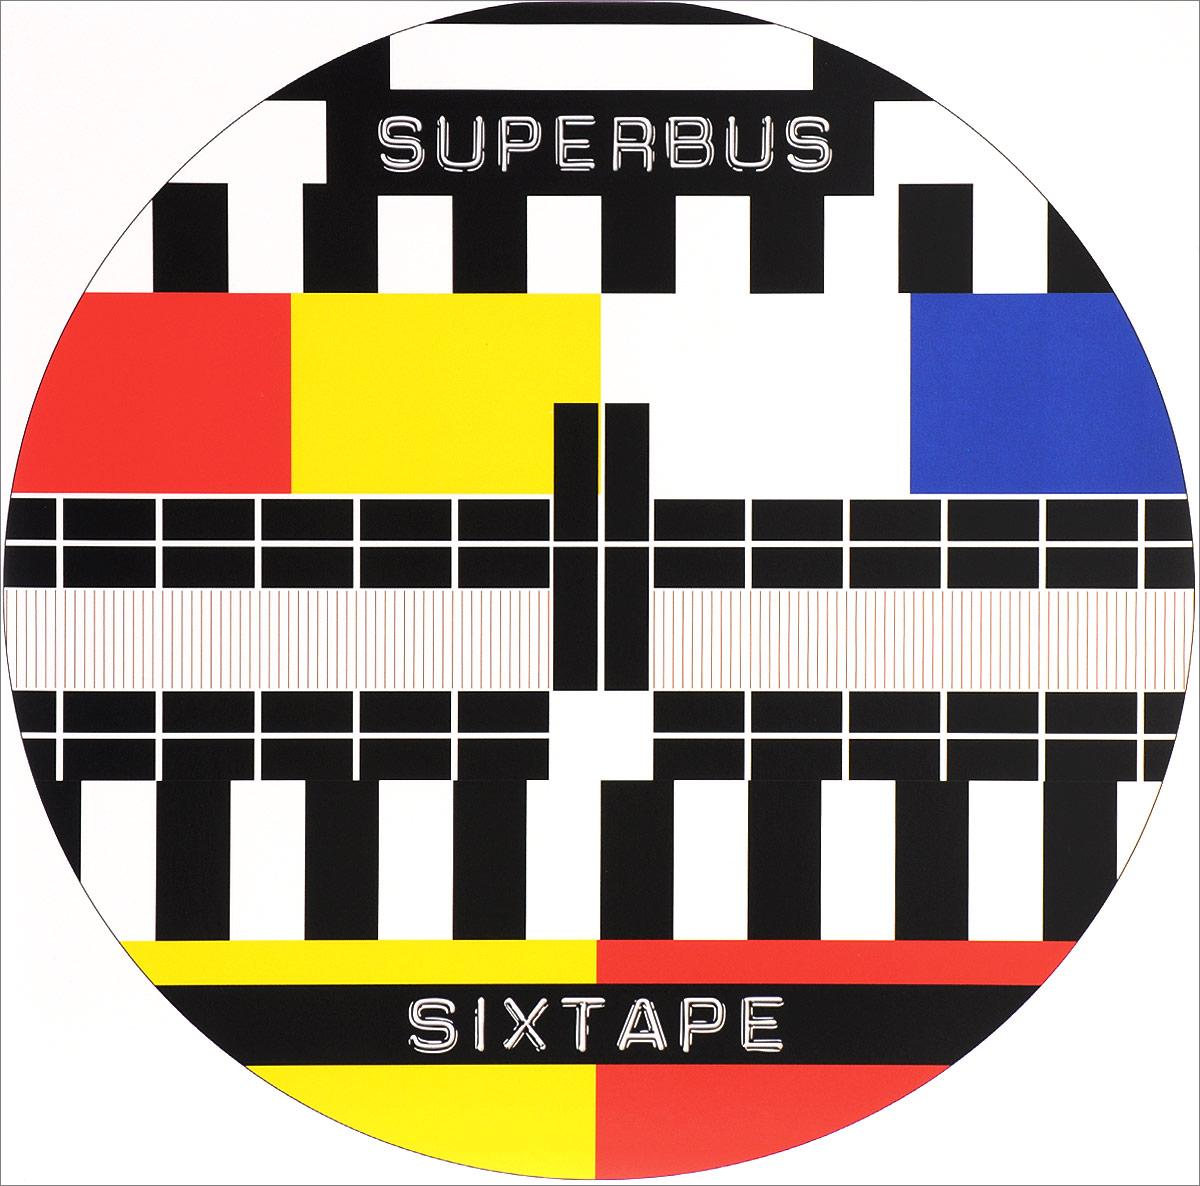 Side 1 Tracks 1 - 7Side 2 Tracks 8 - 14